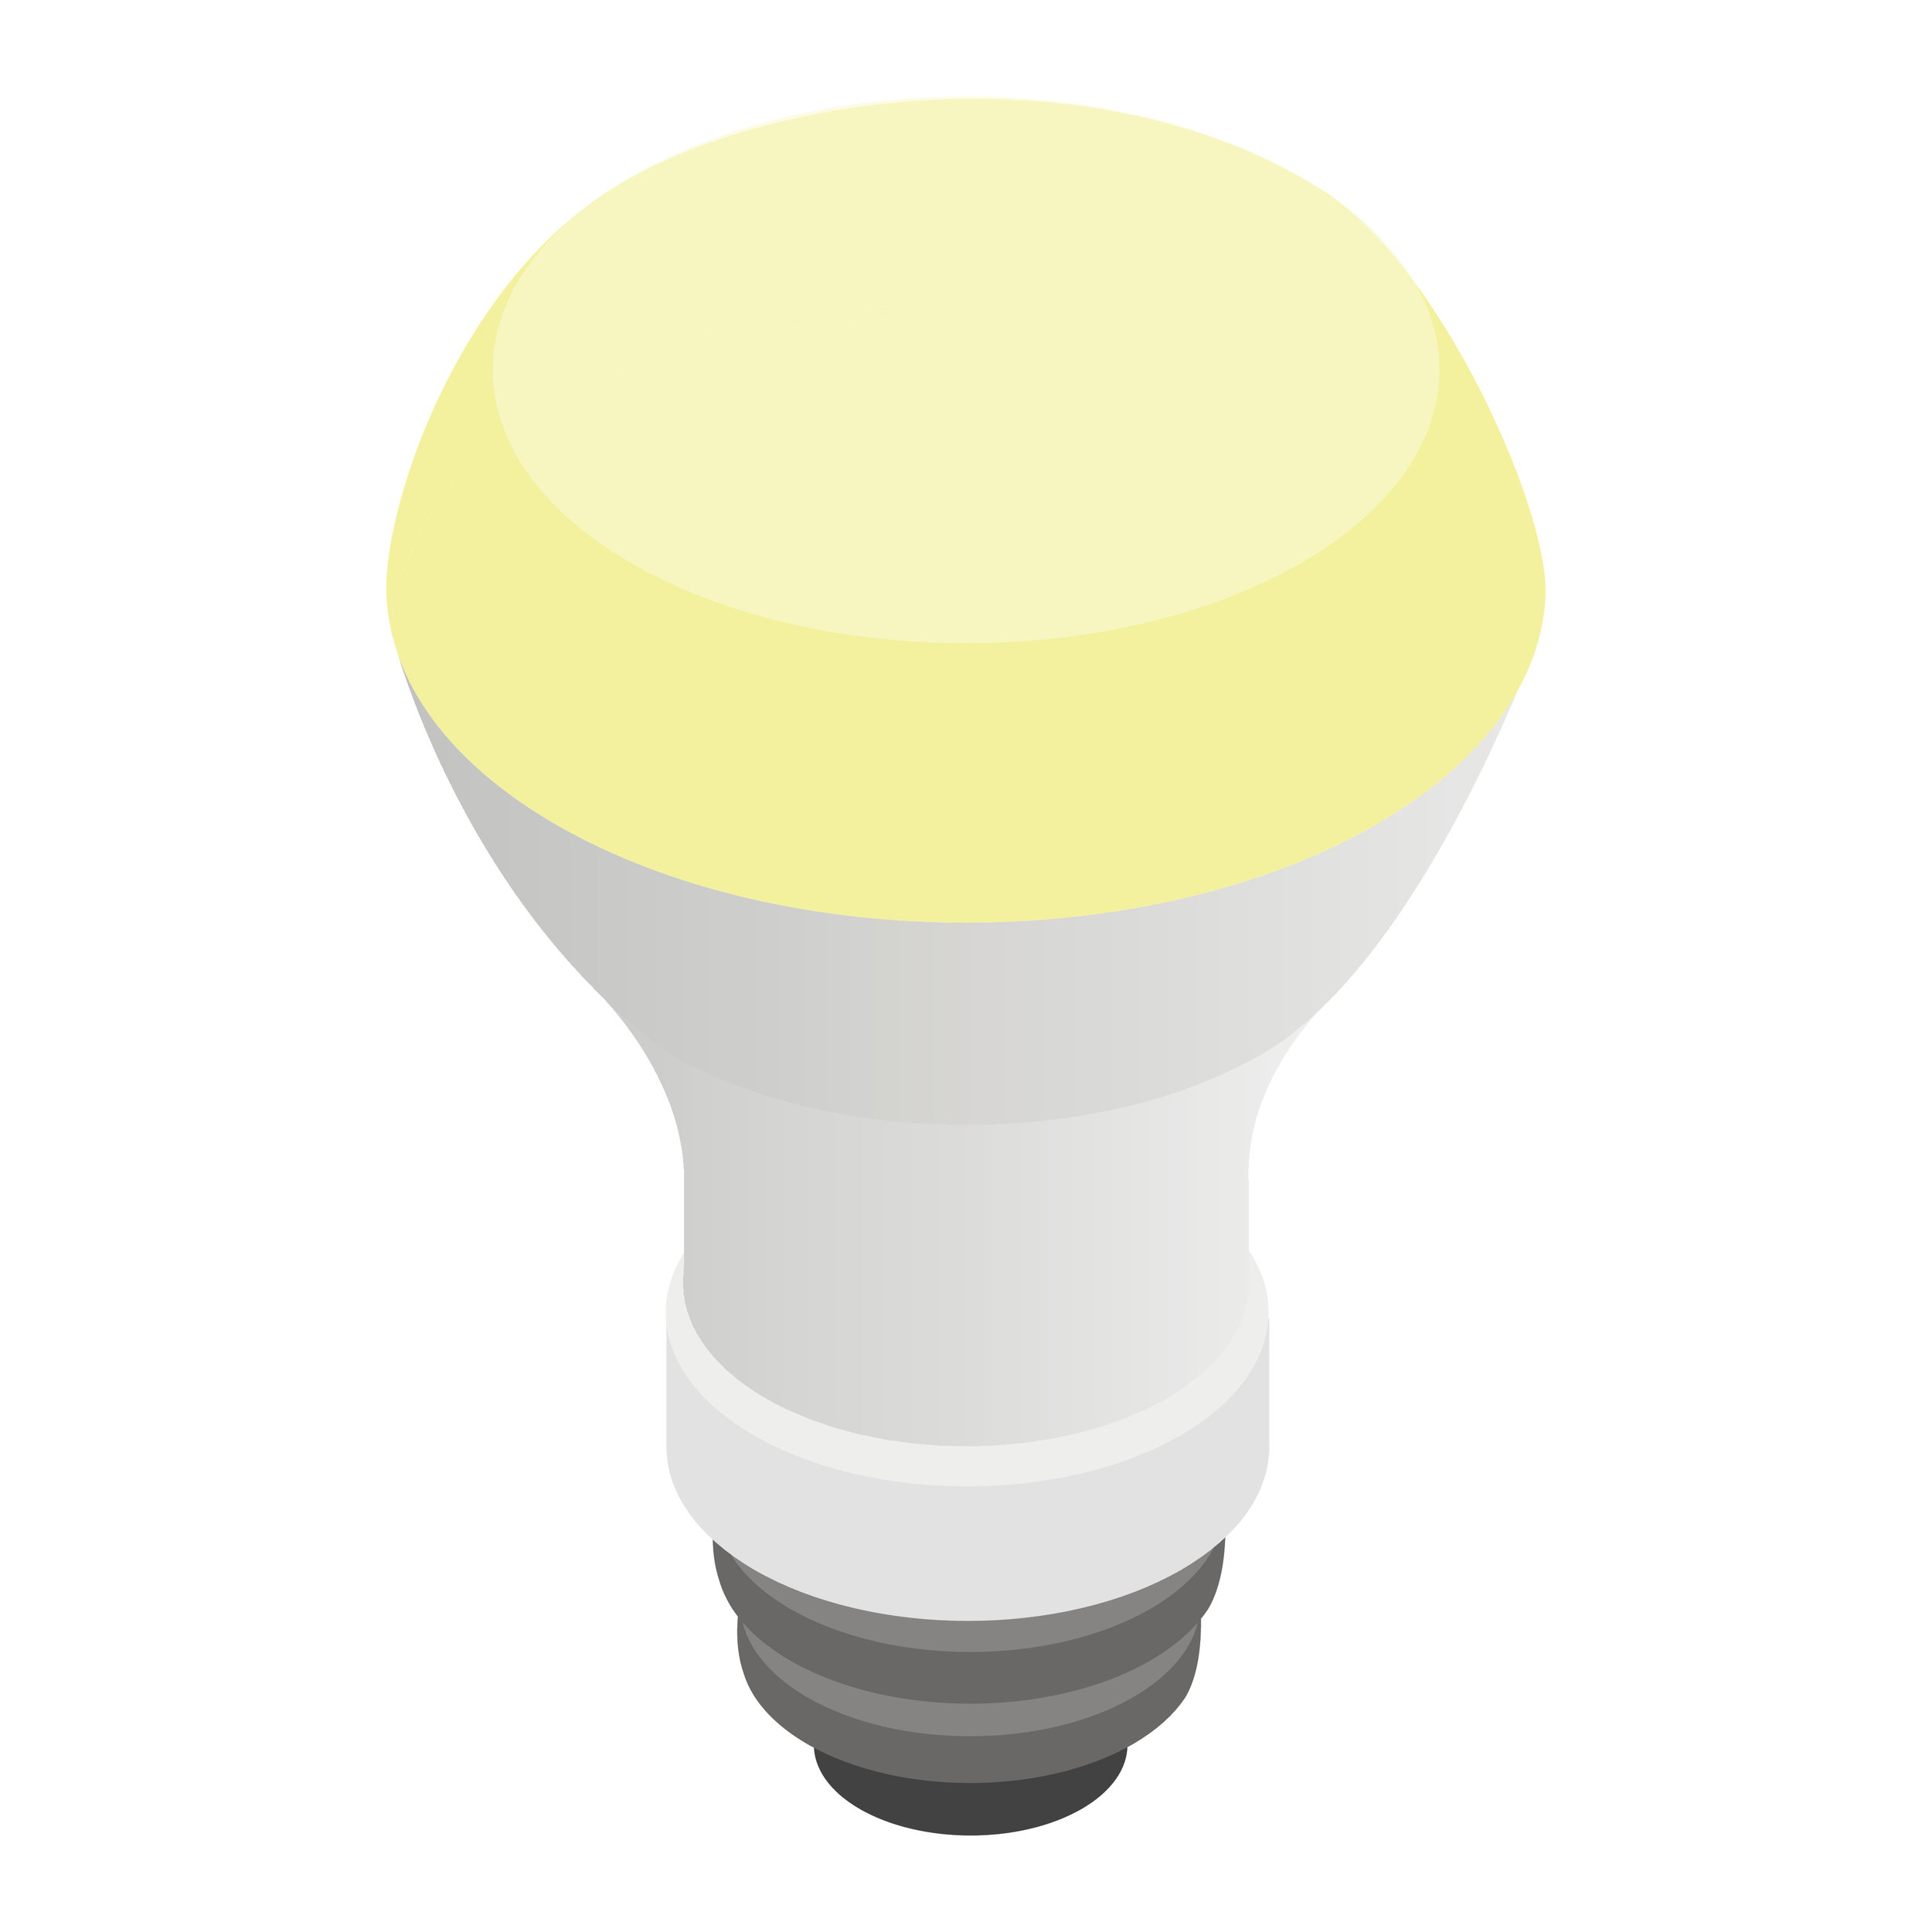 GlowingLED_iStock-678509920.jpg